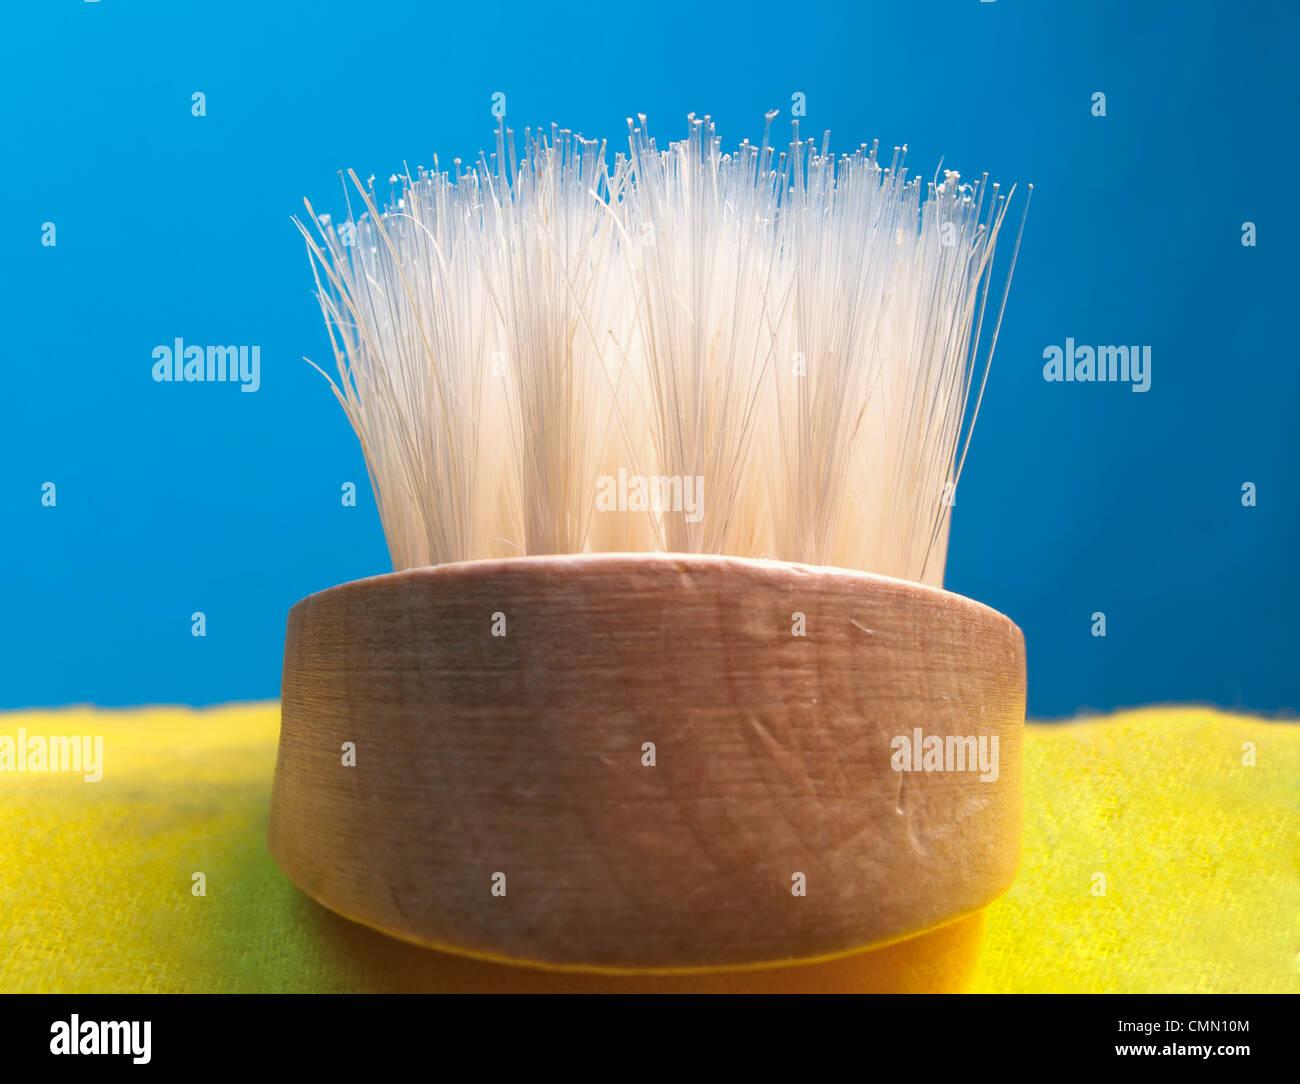 Closeup of bristles on a brush - Stock Image